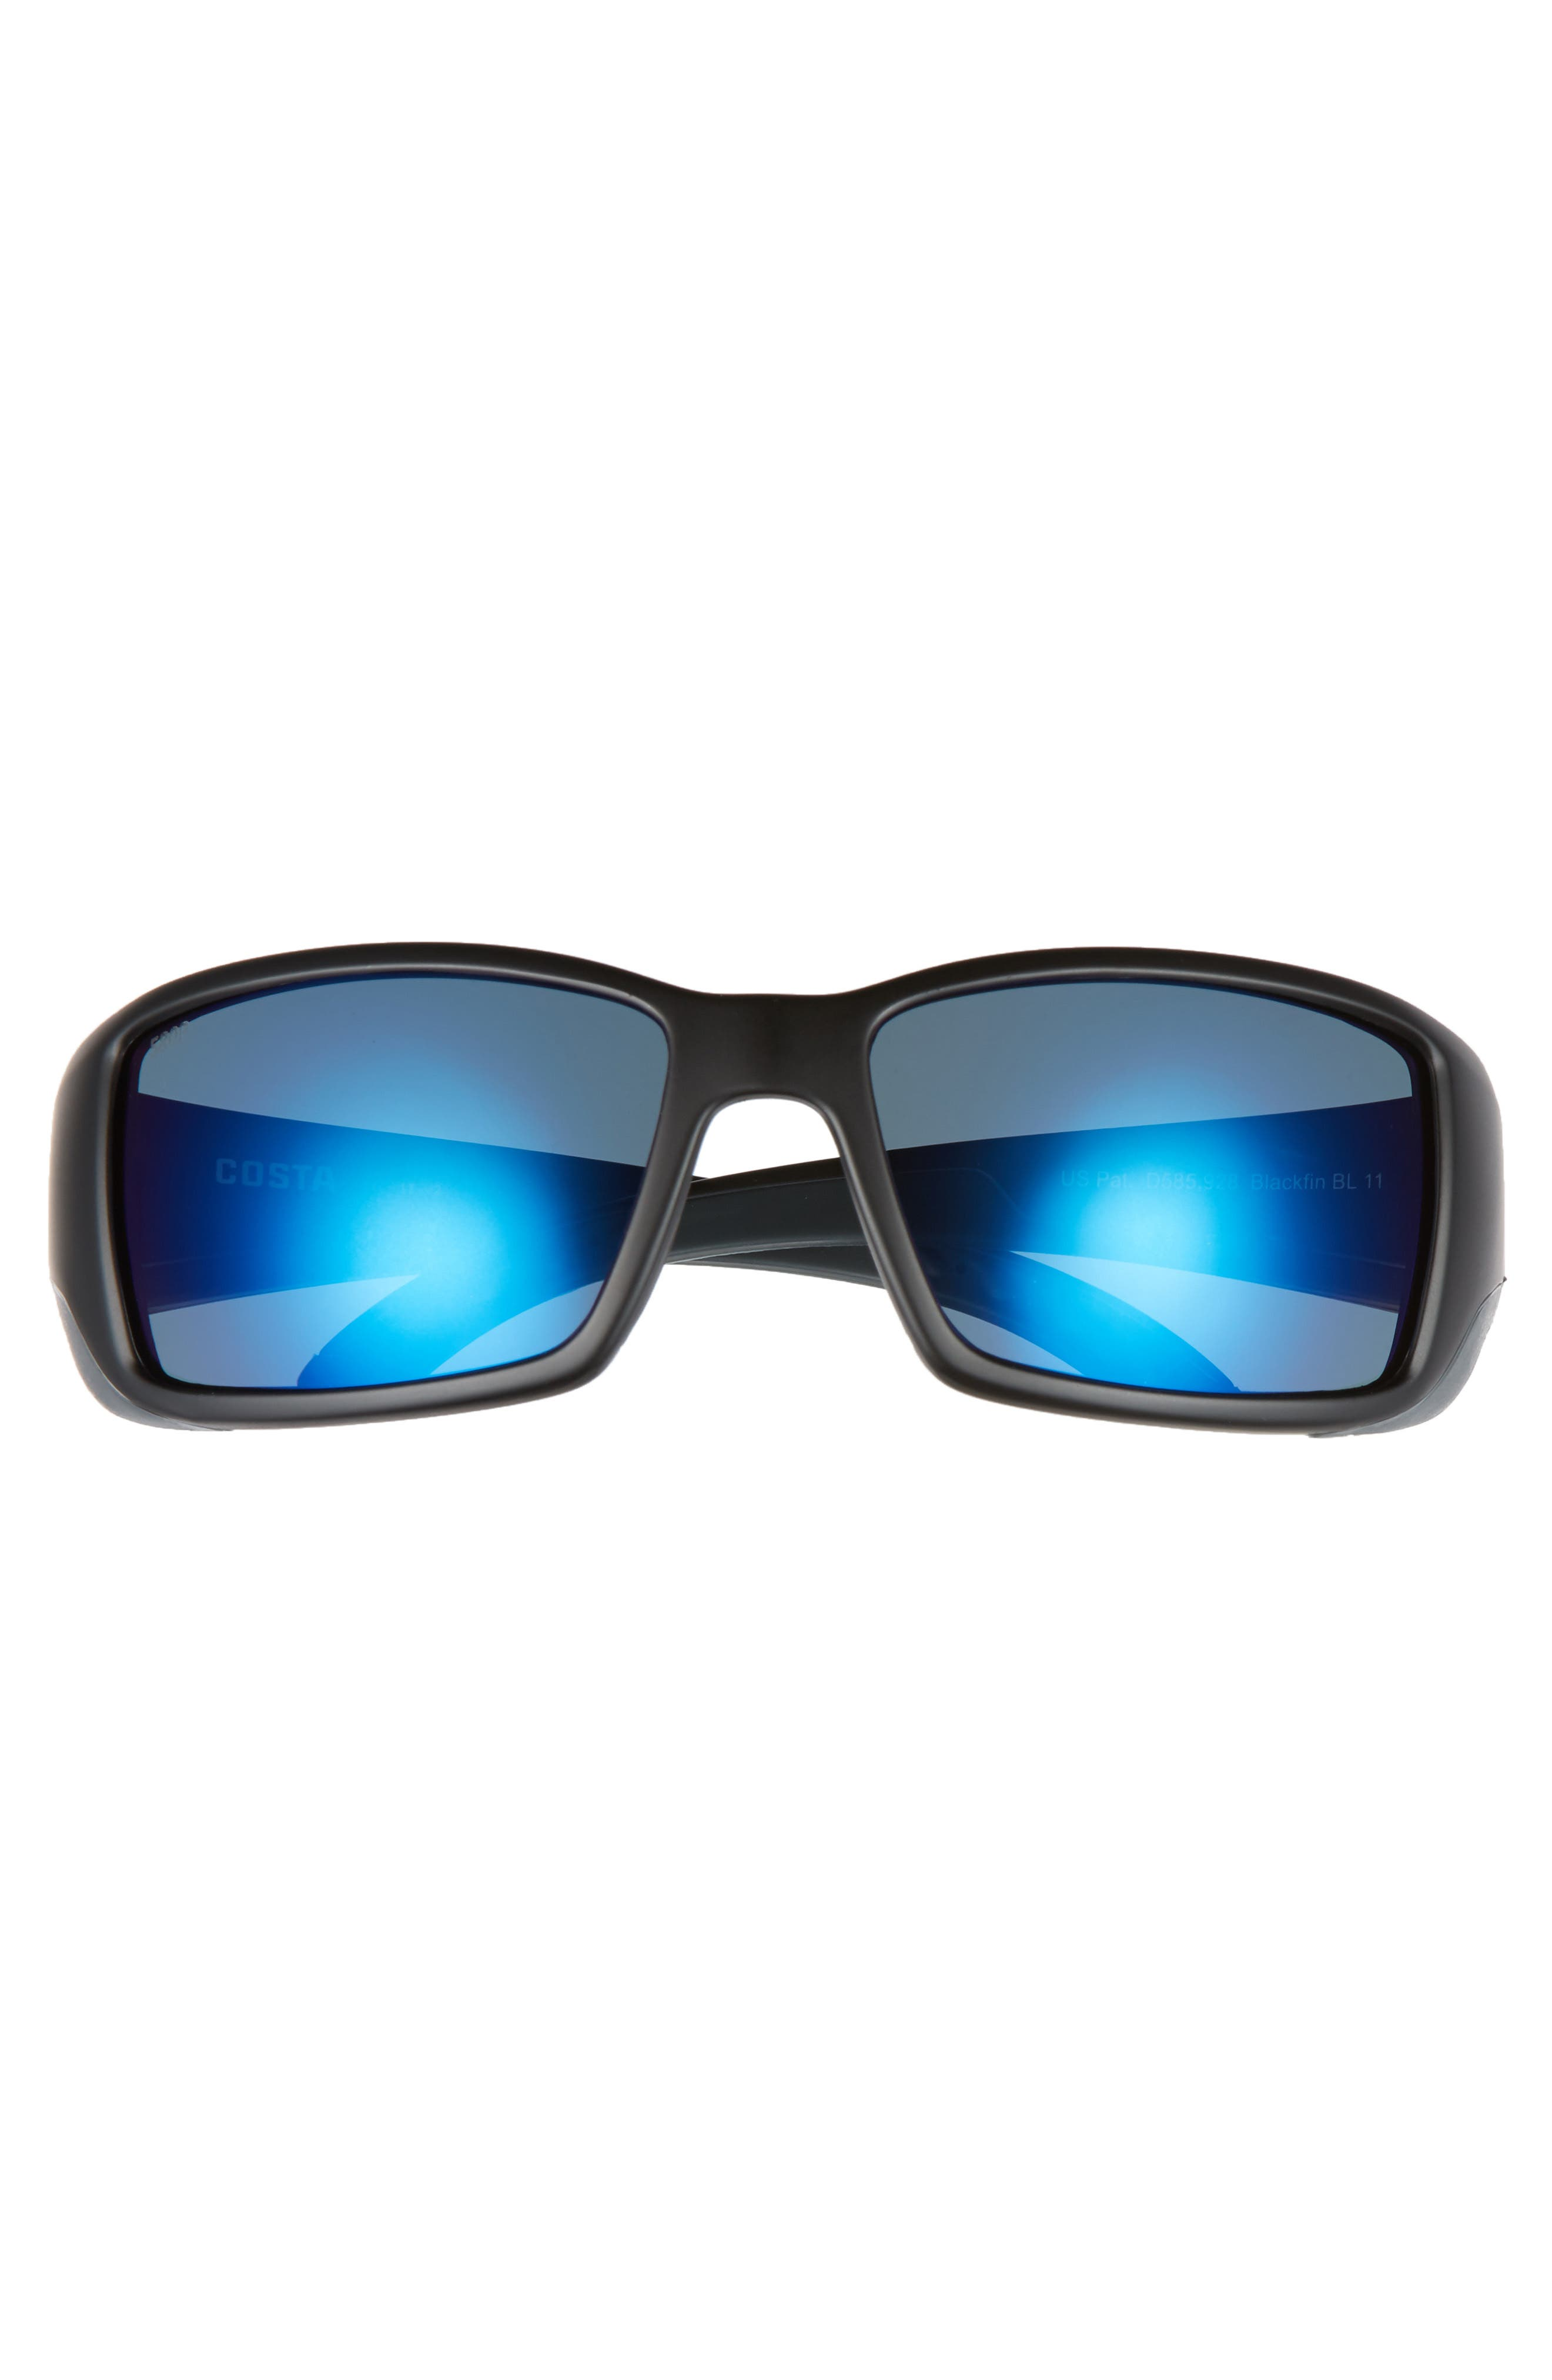 Blackfin 60mm Polarized Sunglasses,                             Alternate thumbnail 2, color,                             001